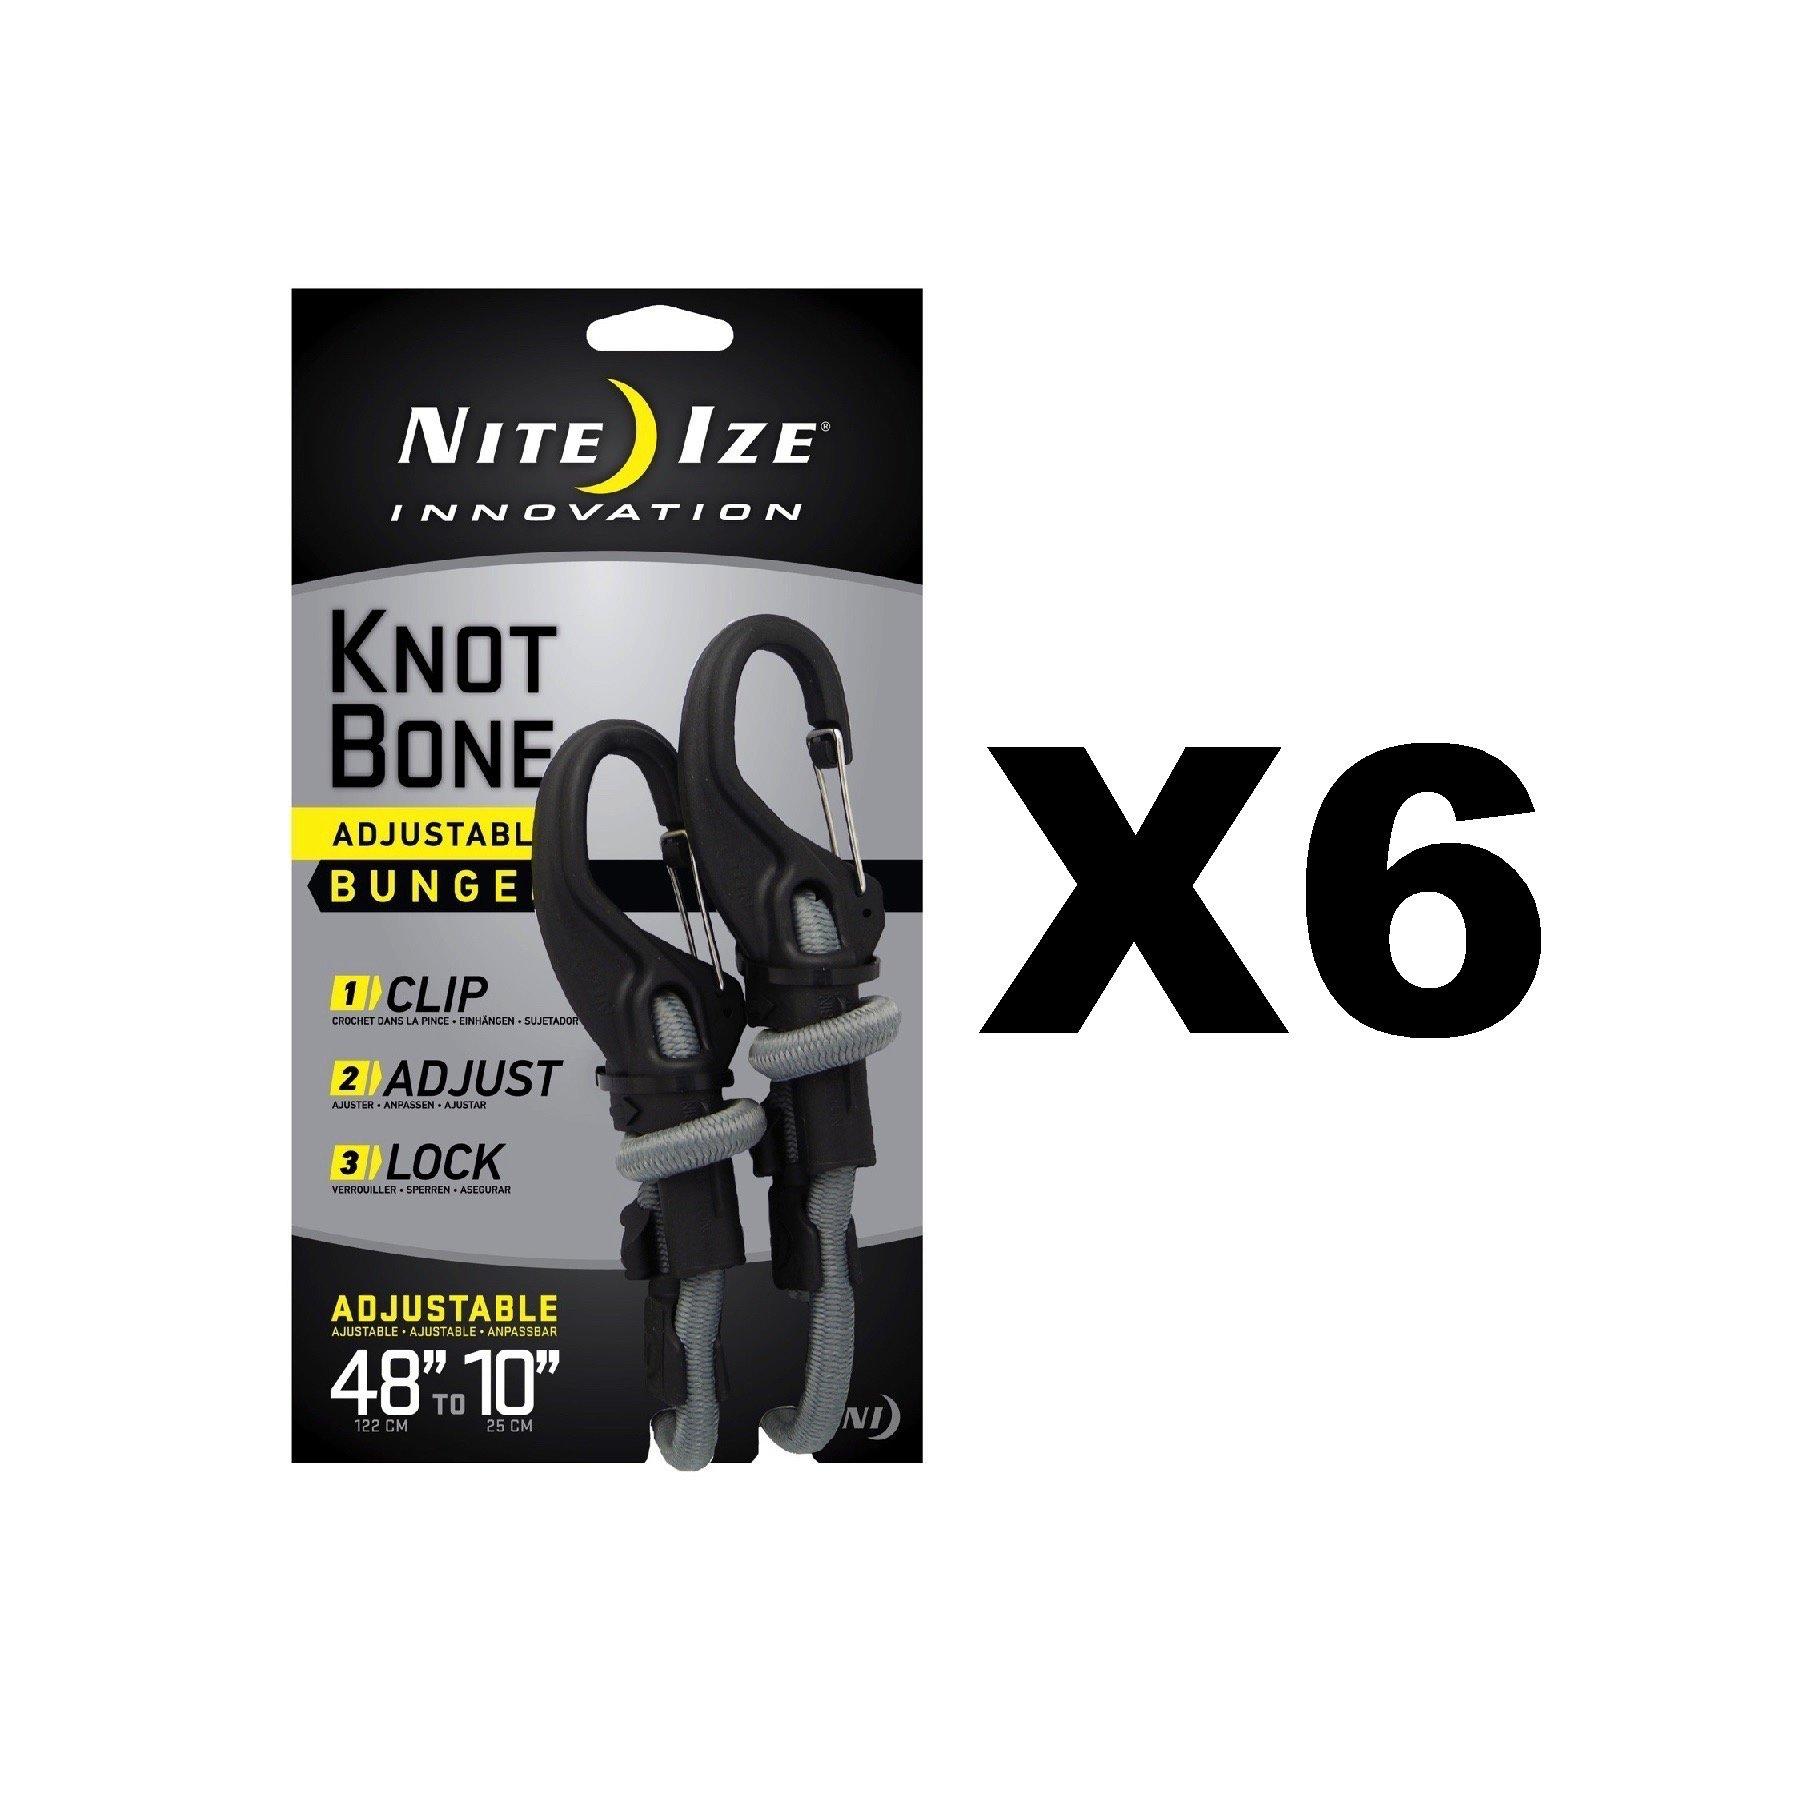 Nite Ize KnotBone Adjustable Bungee Large 9mm 10''-48'' w/ Carabiner Clip (6-Pack)